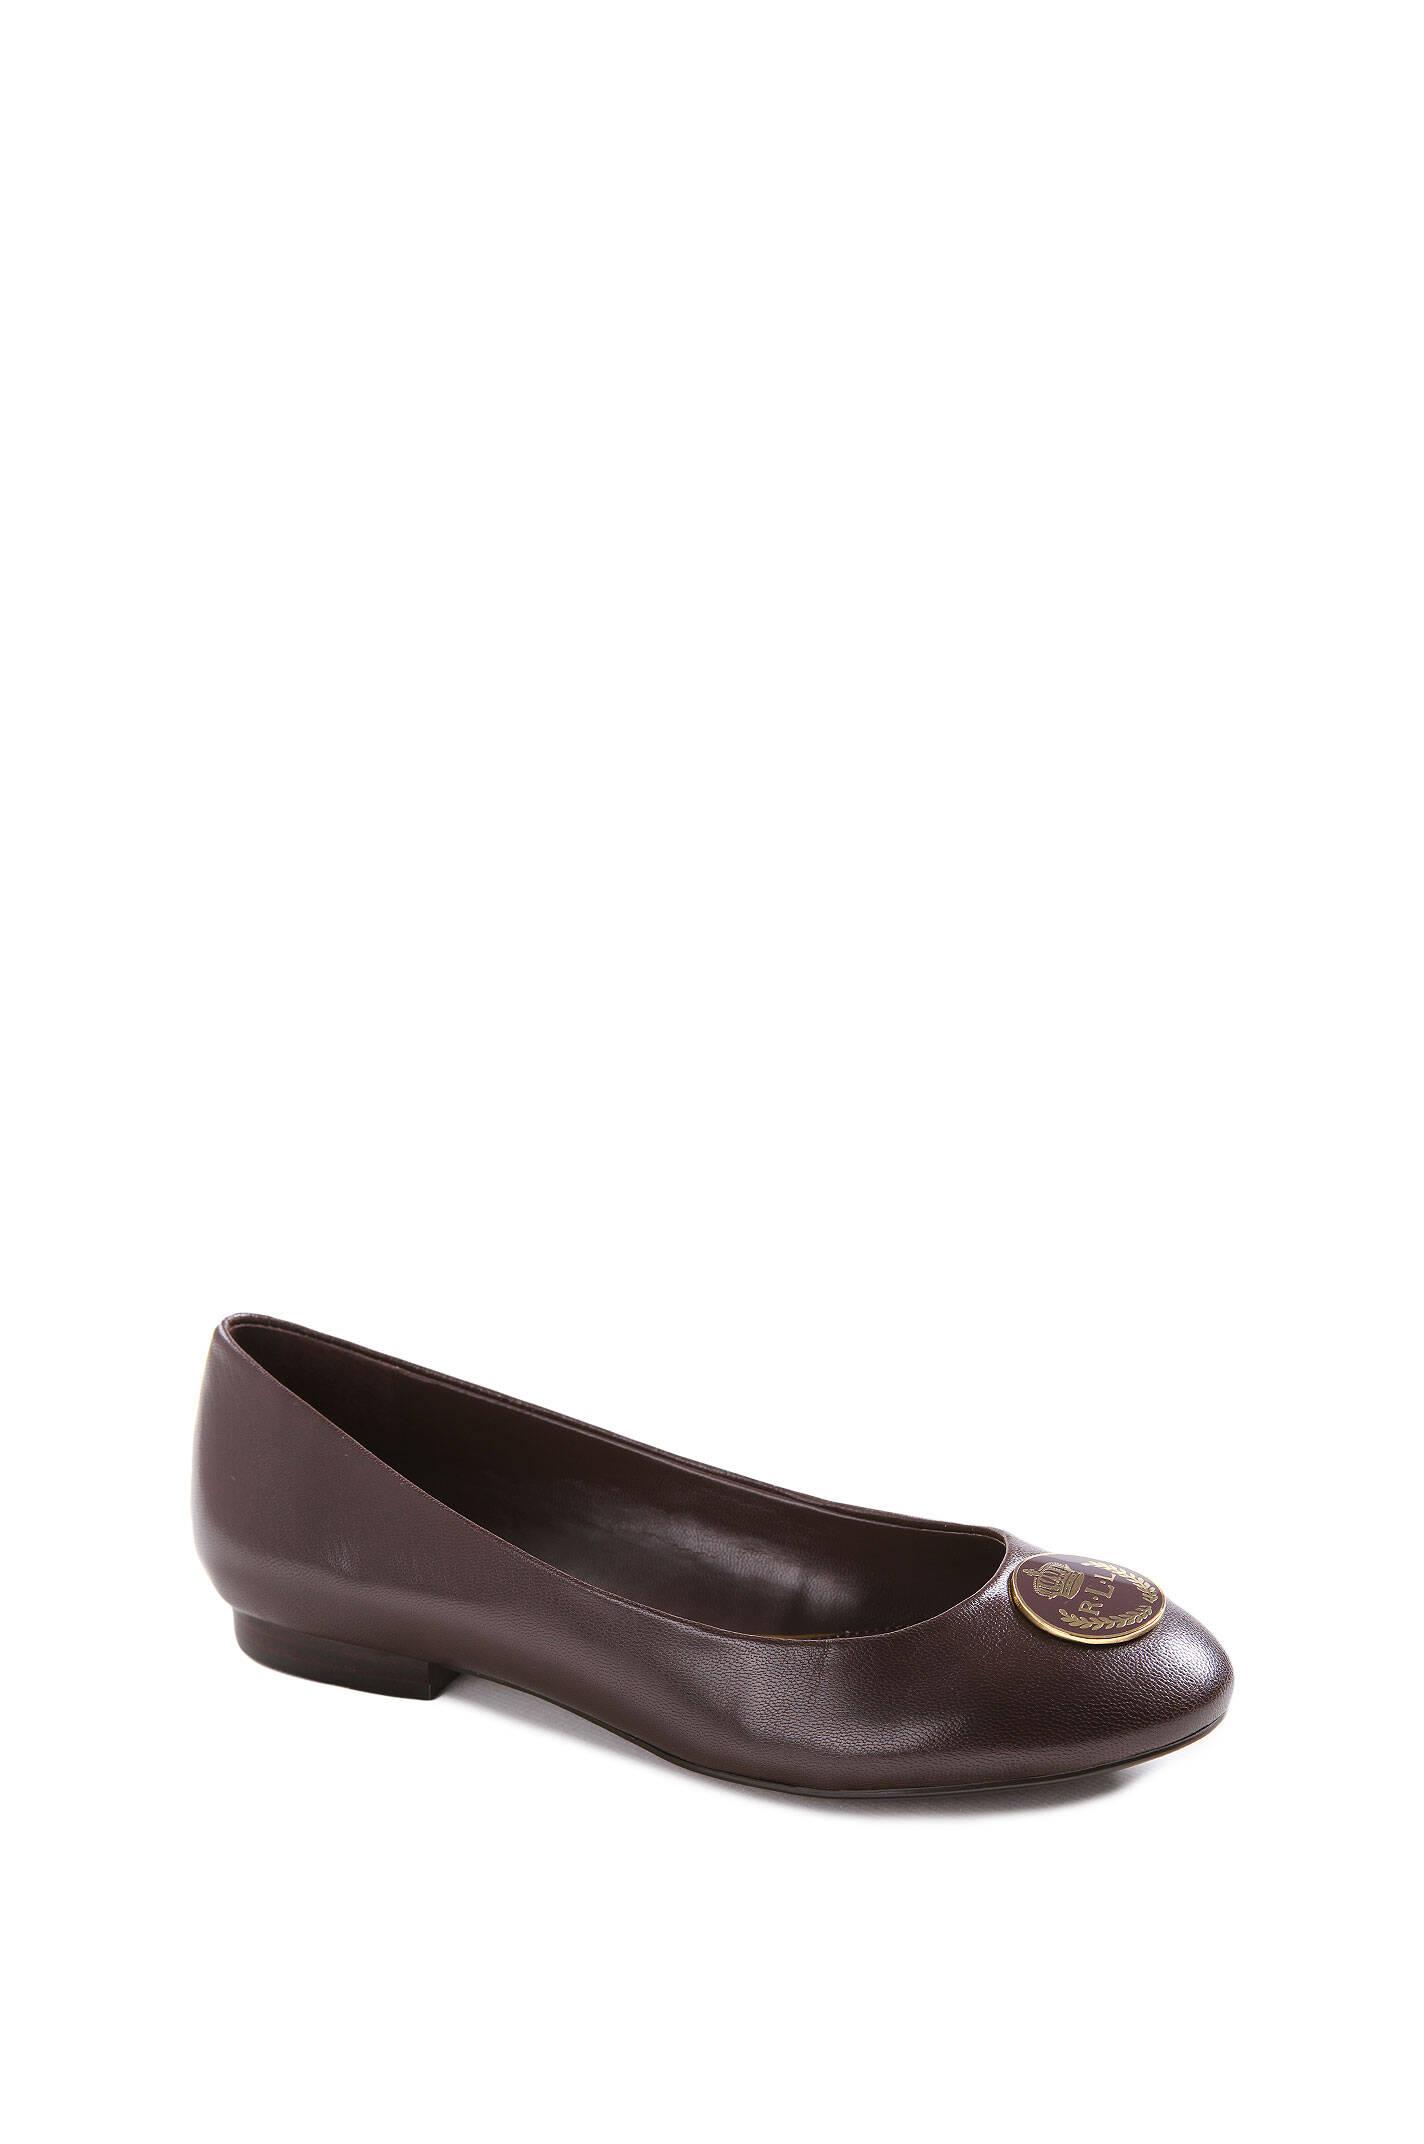 averie ballet flats lauren ralph lauren brown shoes. Black Bedroom Furniture Sets. Home Design Ideas